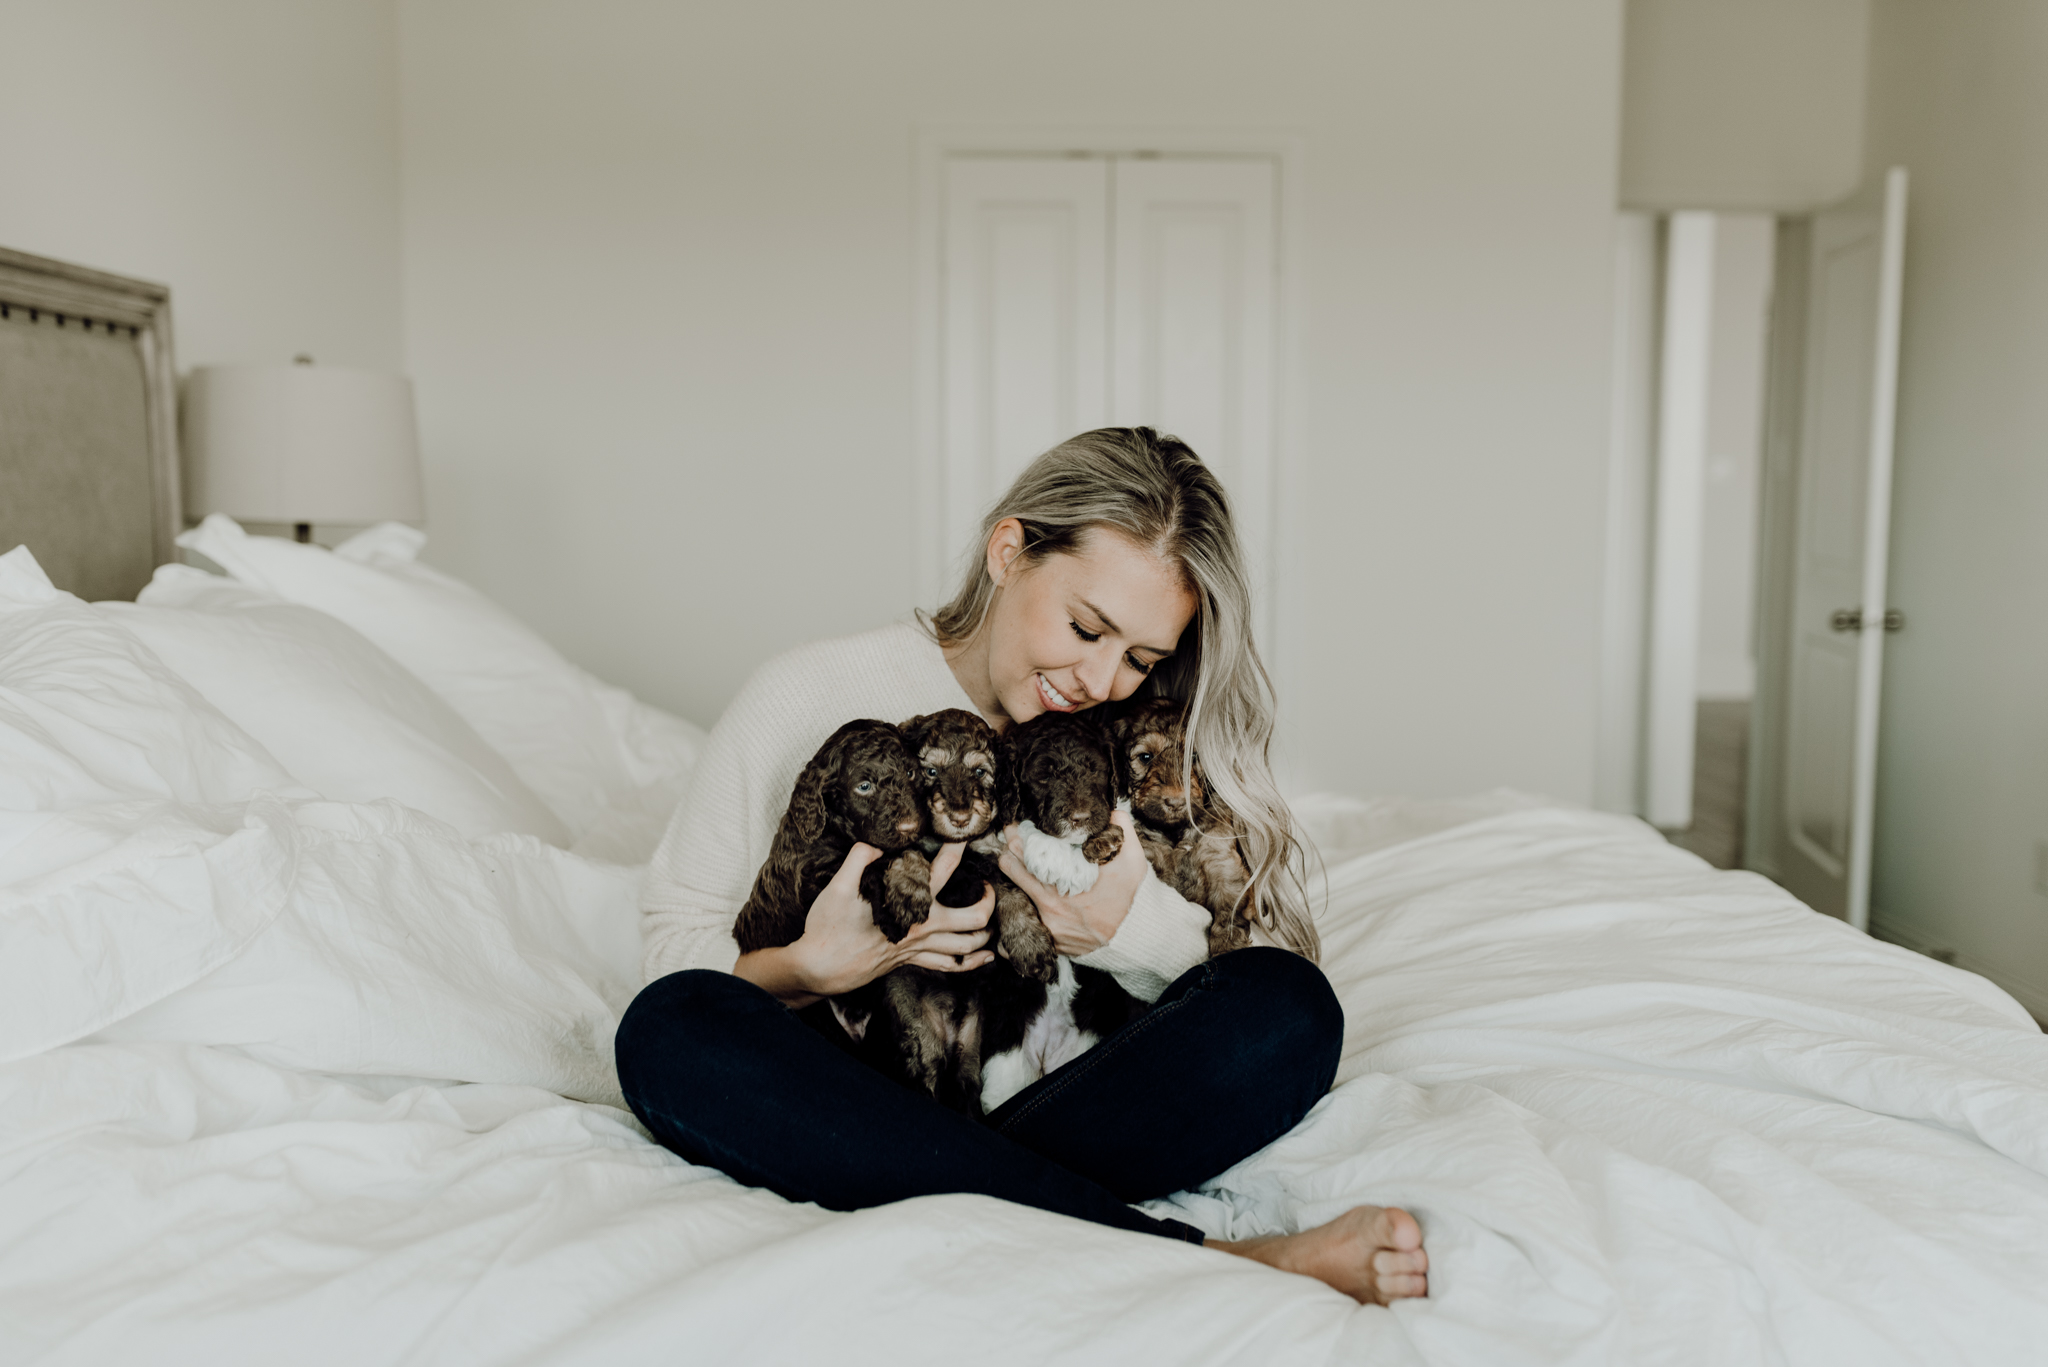 houston-wedding-photographer-in-home-maternity-session-puppies- Houston Wedding Photographer -Kristen Giles Photography-61.jpg